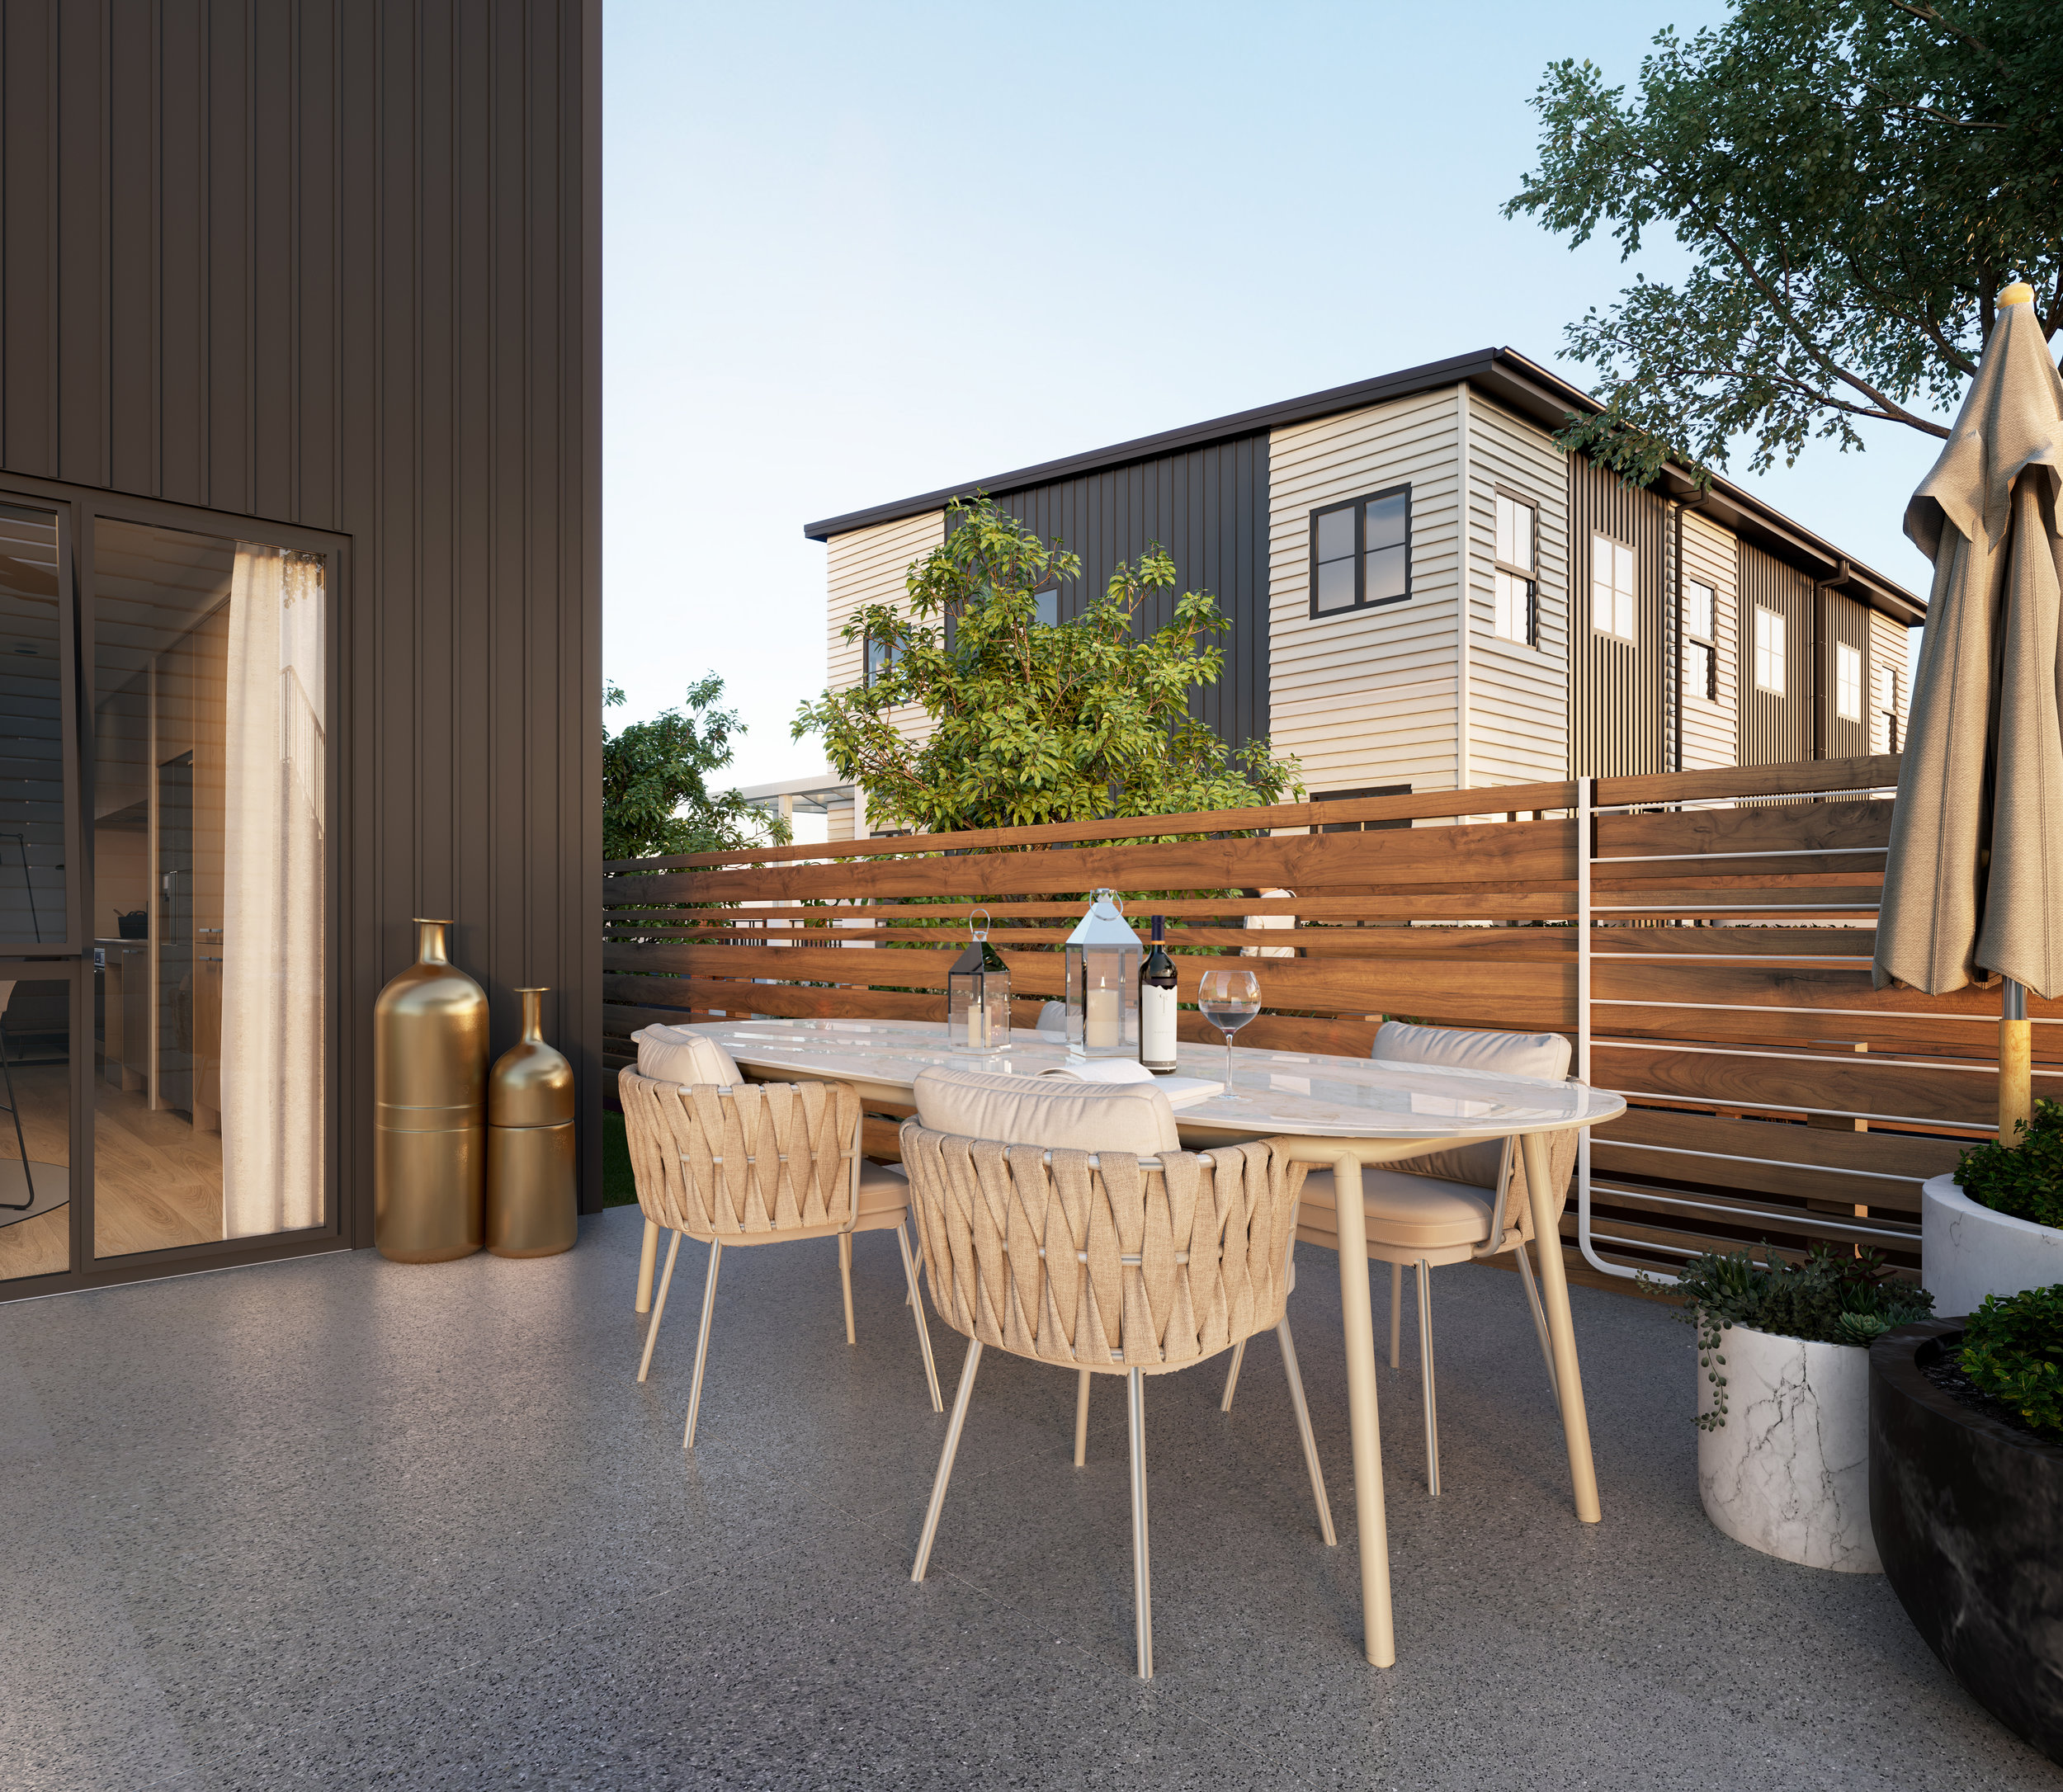 Exterior_Courtyard.jpg